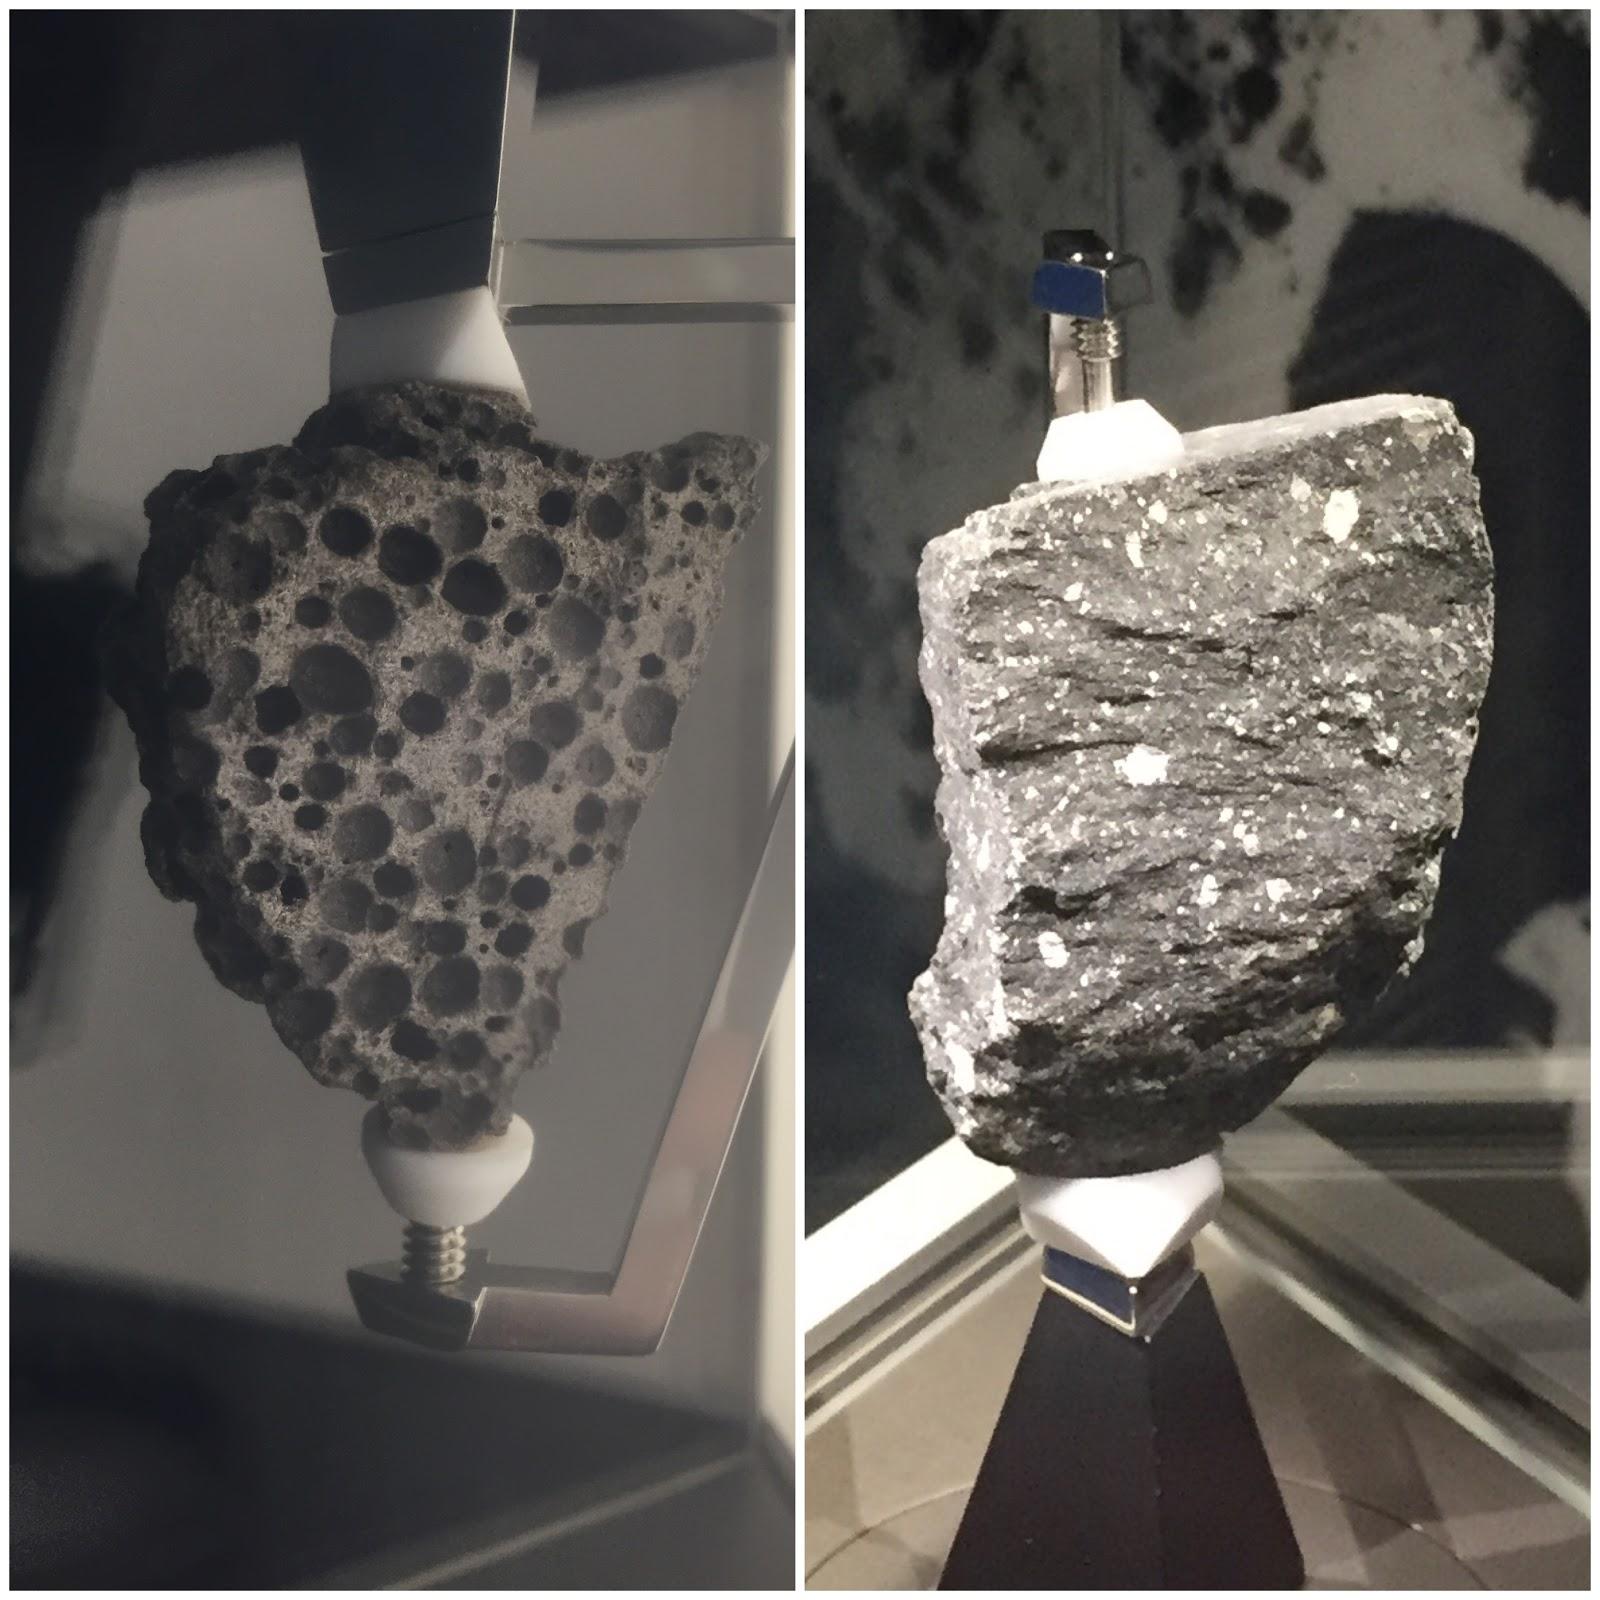 moon rock displays